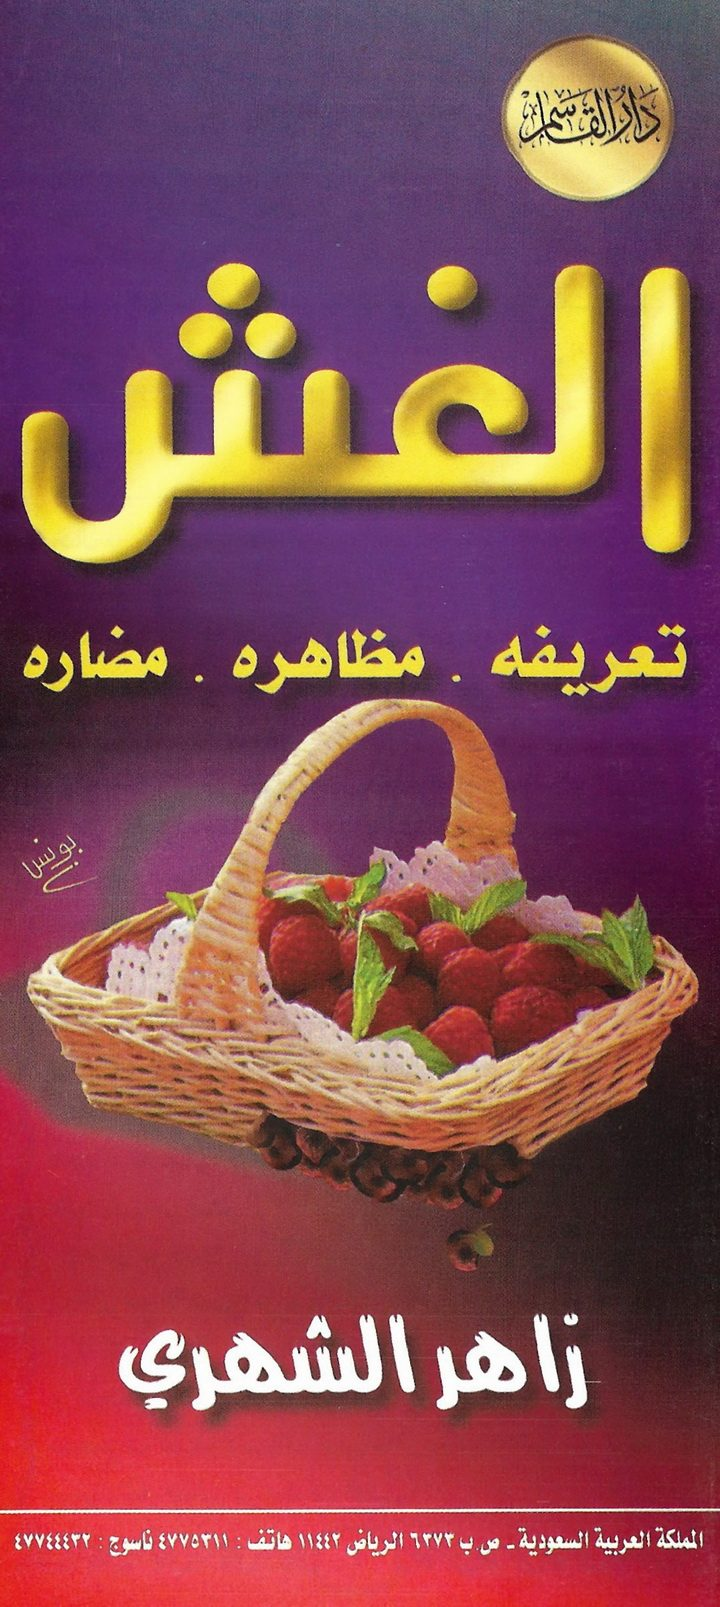 الغش تعريفه، مظاهره، مضاره (زاهر الشهري – دار القاسم)